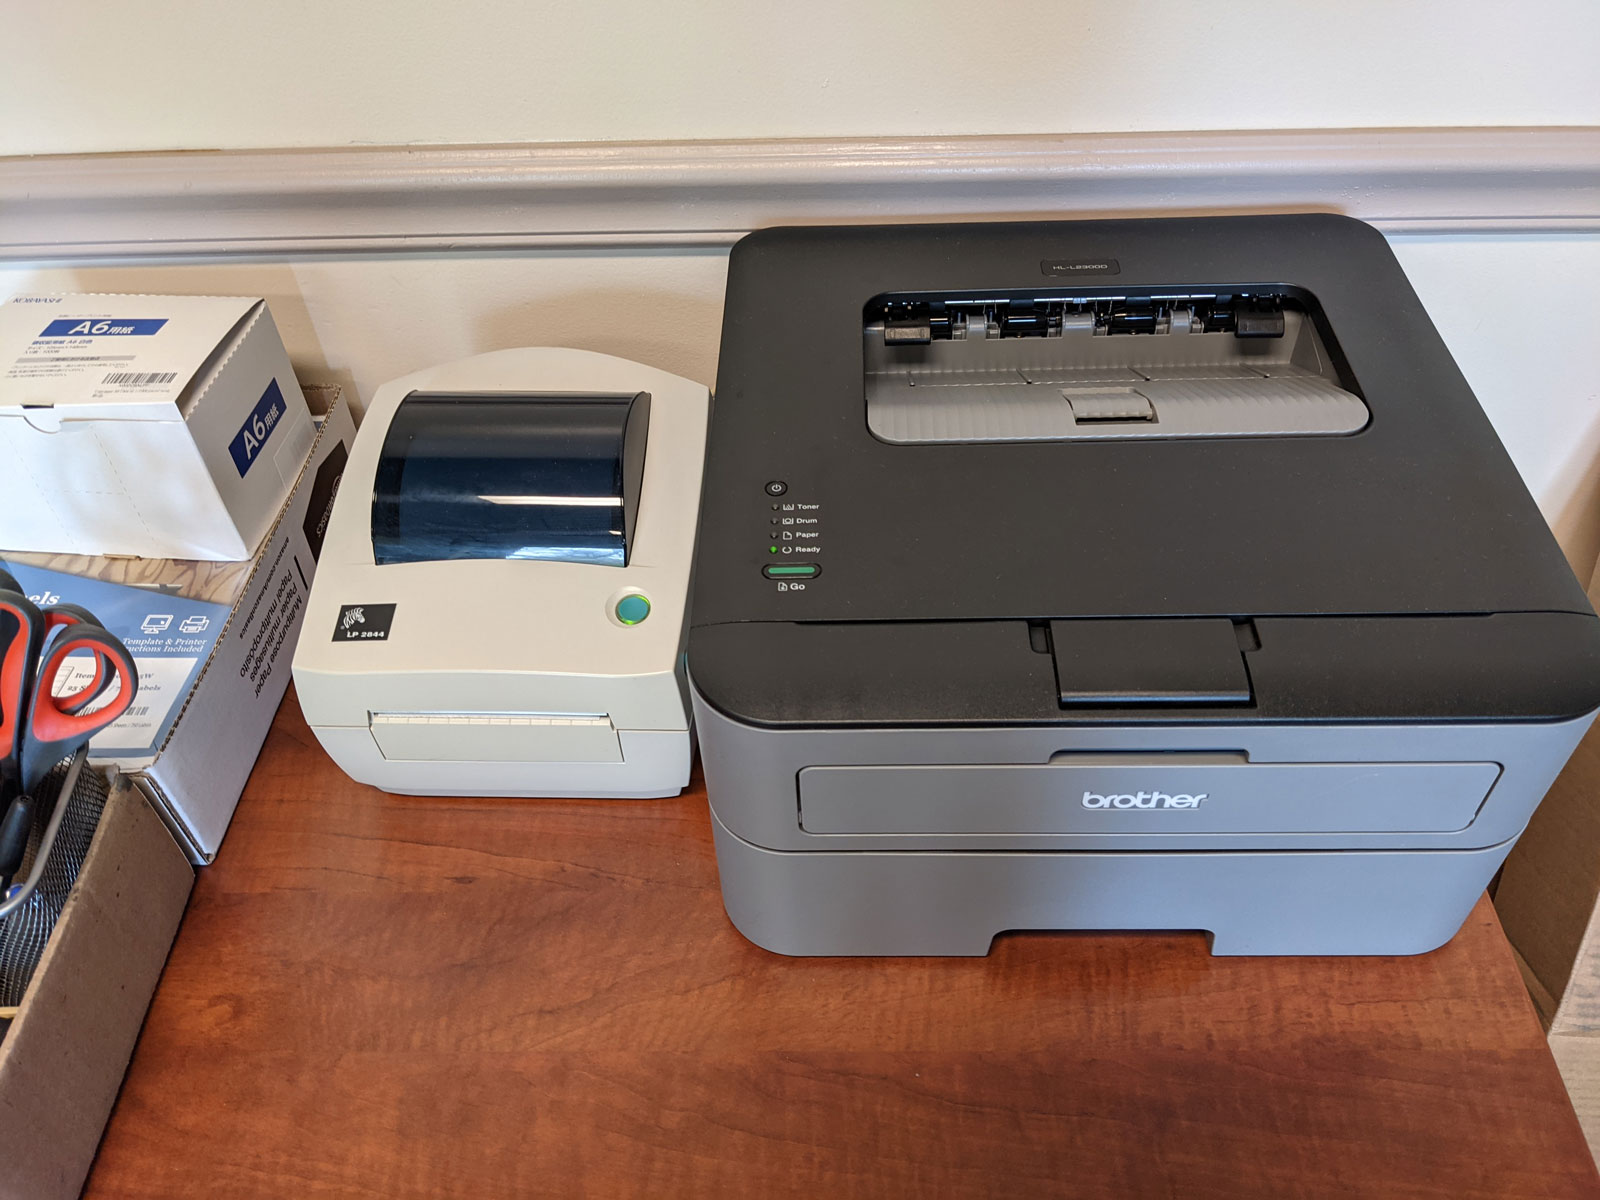 Photo of printers on my desk